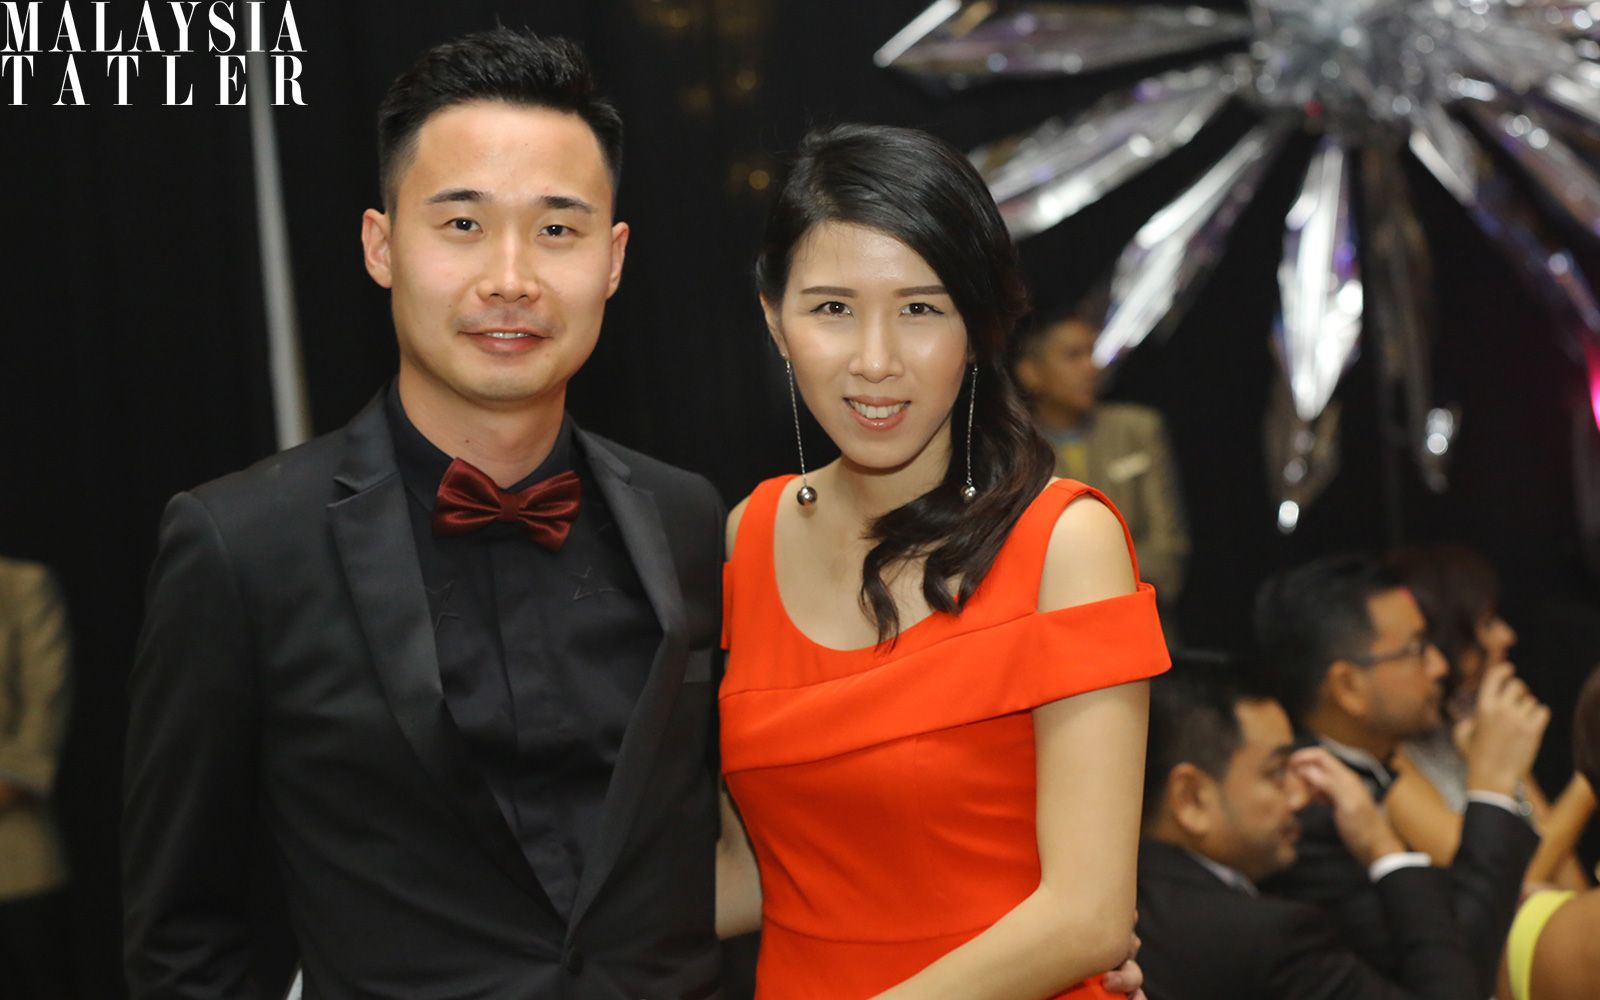 Matthew Lim and Clairyn Chong